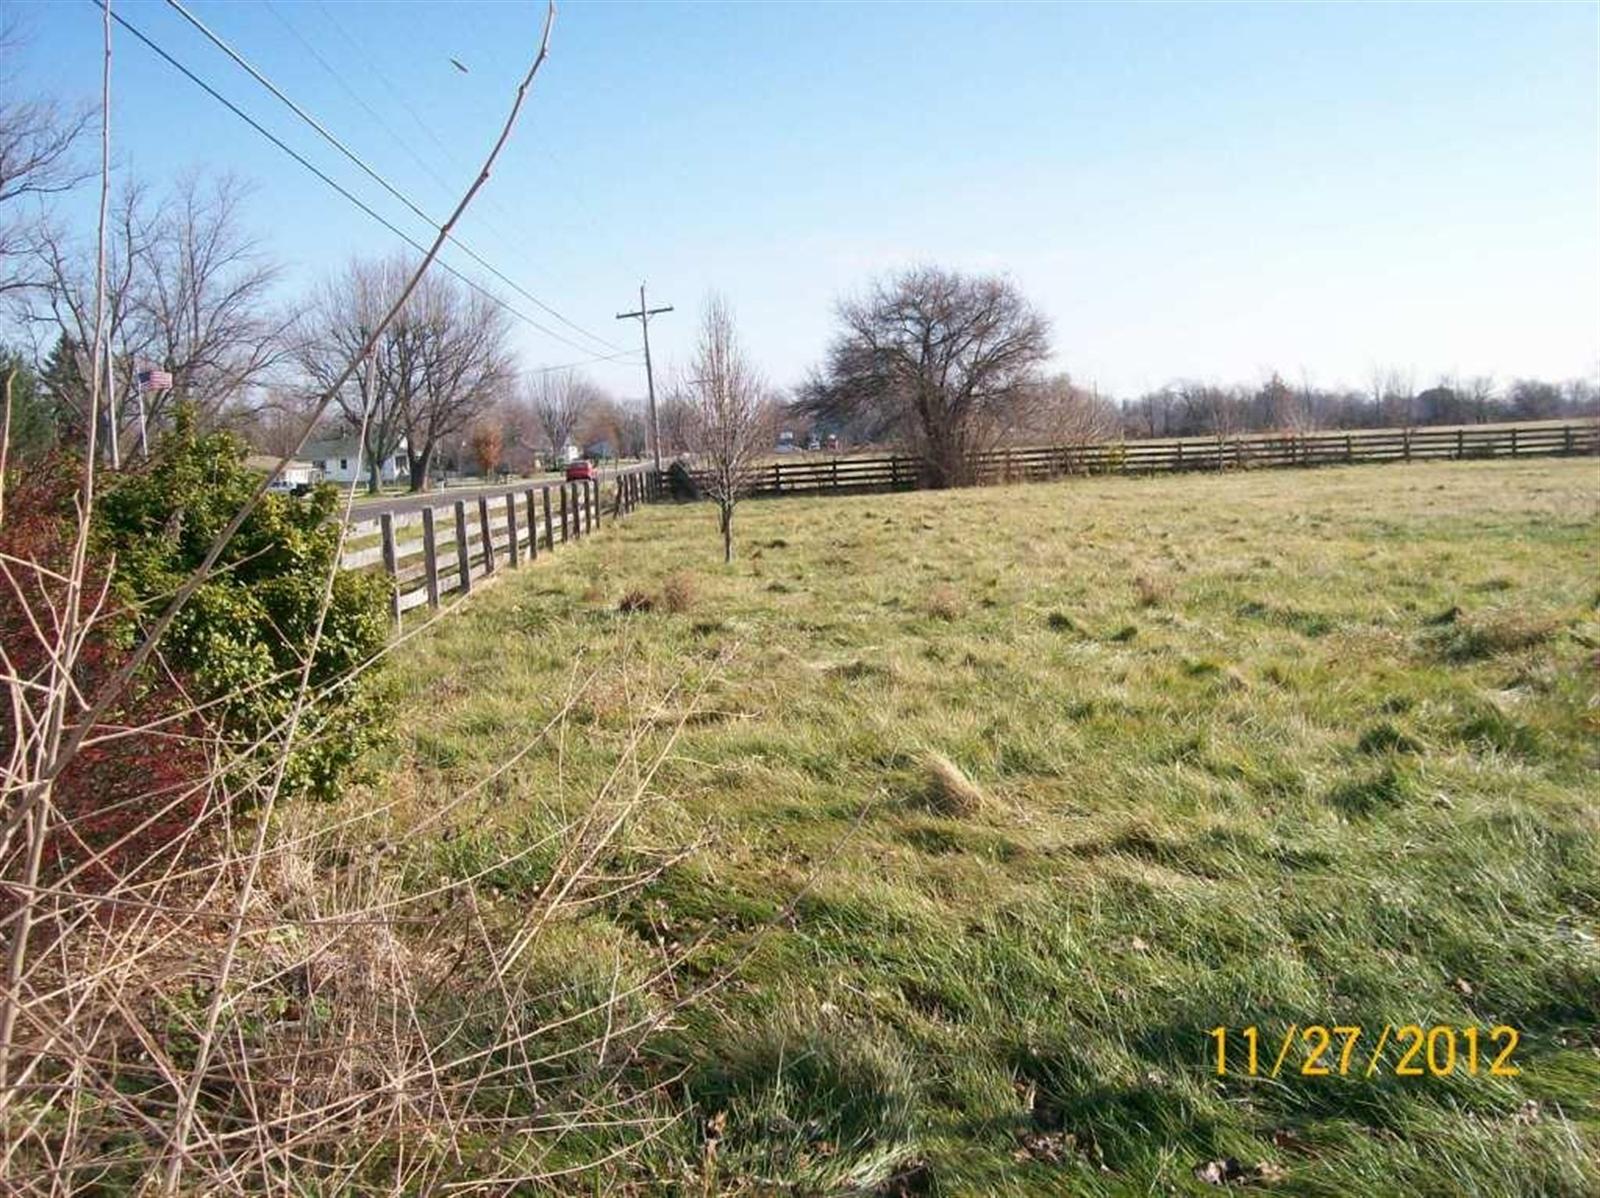 Real Estate Photography - 3077 E SR 236, ANDERSON, IN, 46011 - Location 17